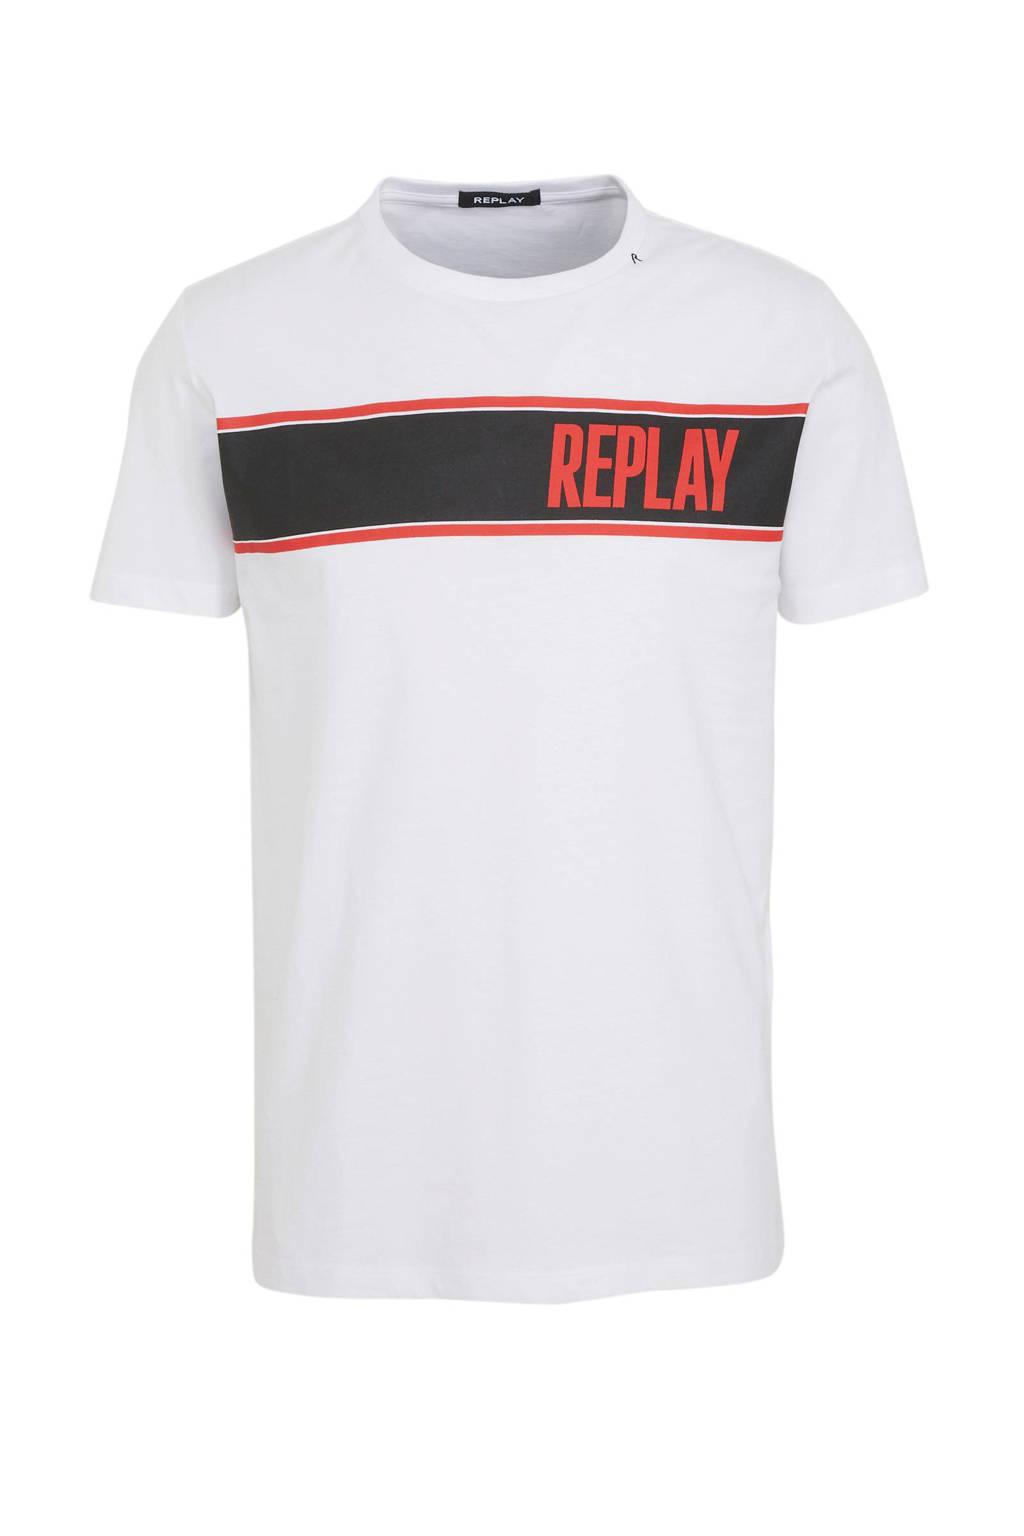 REPLAY T-shirt met printopdruk wit, Wit